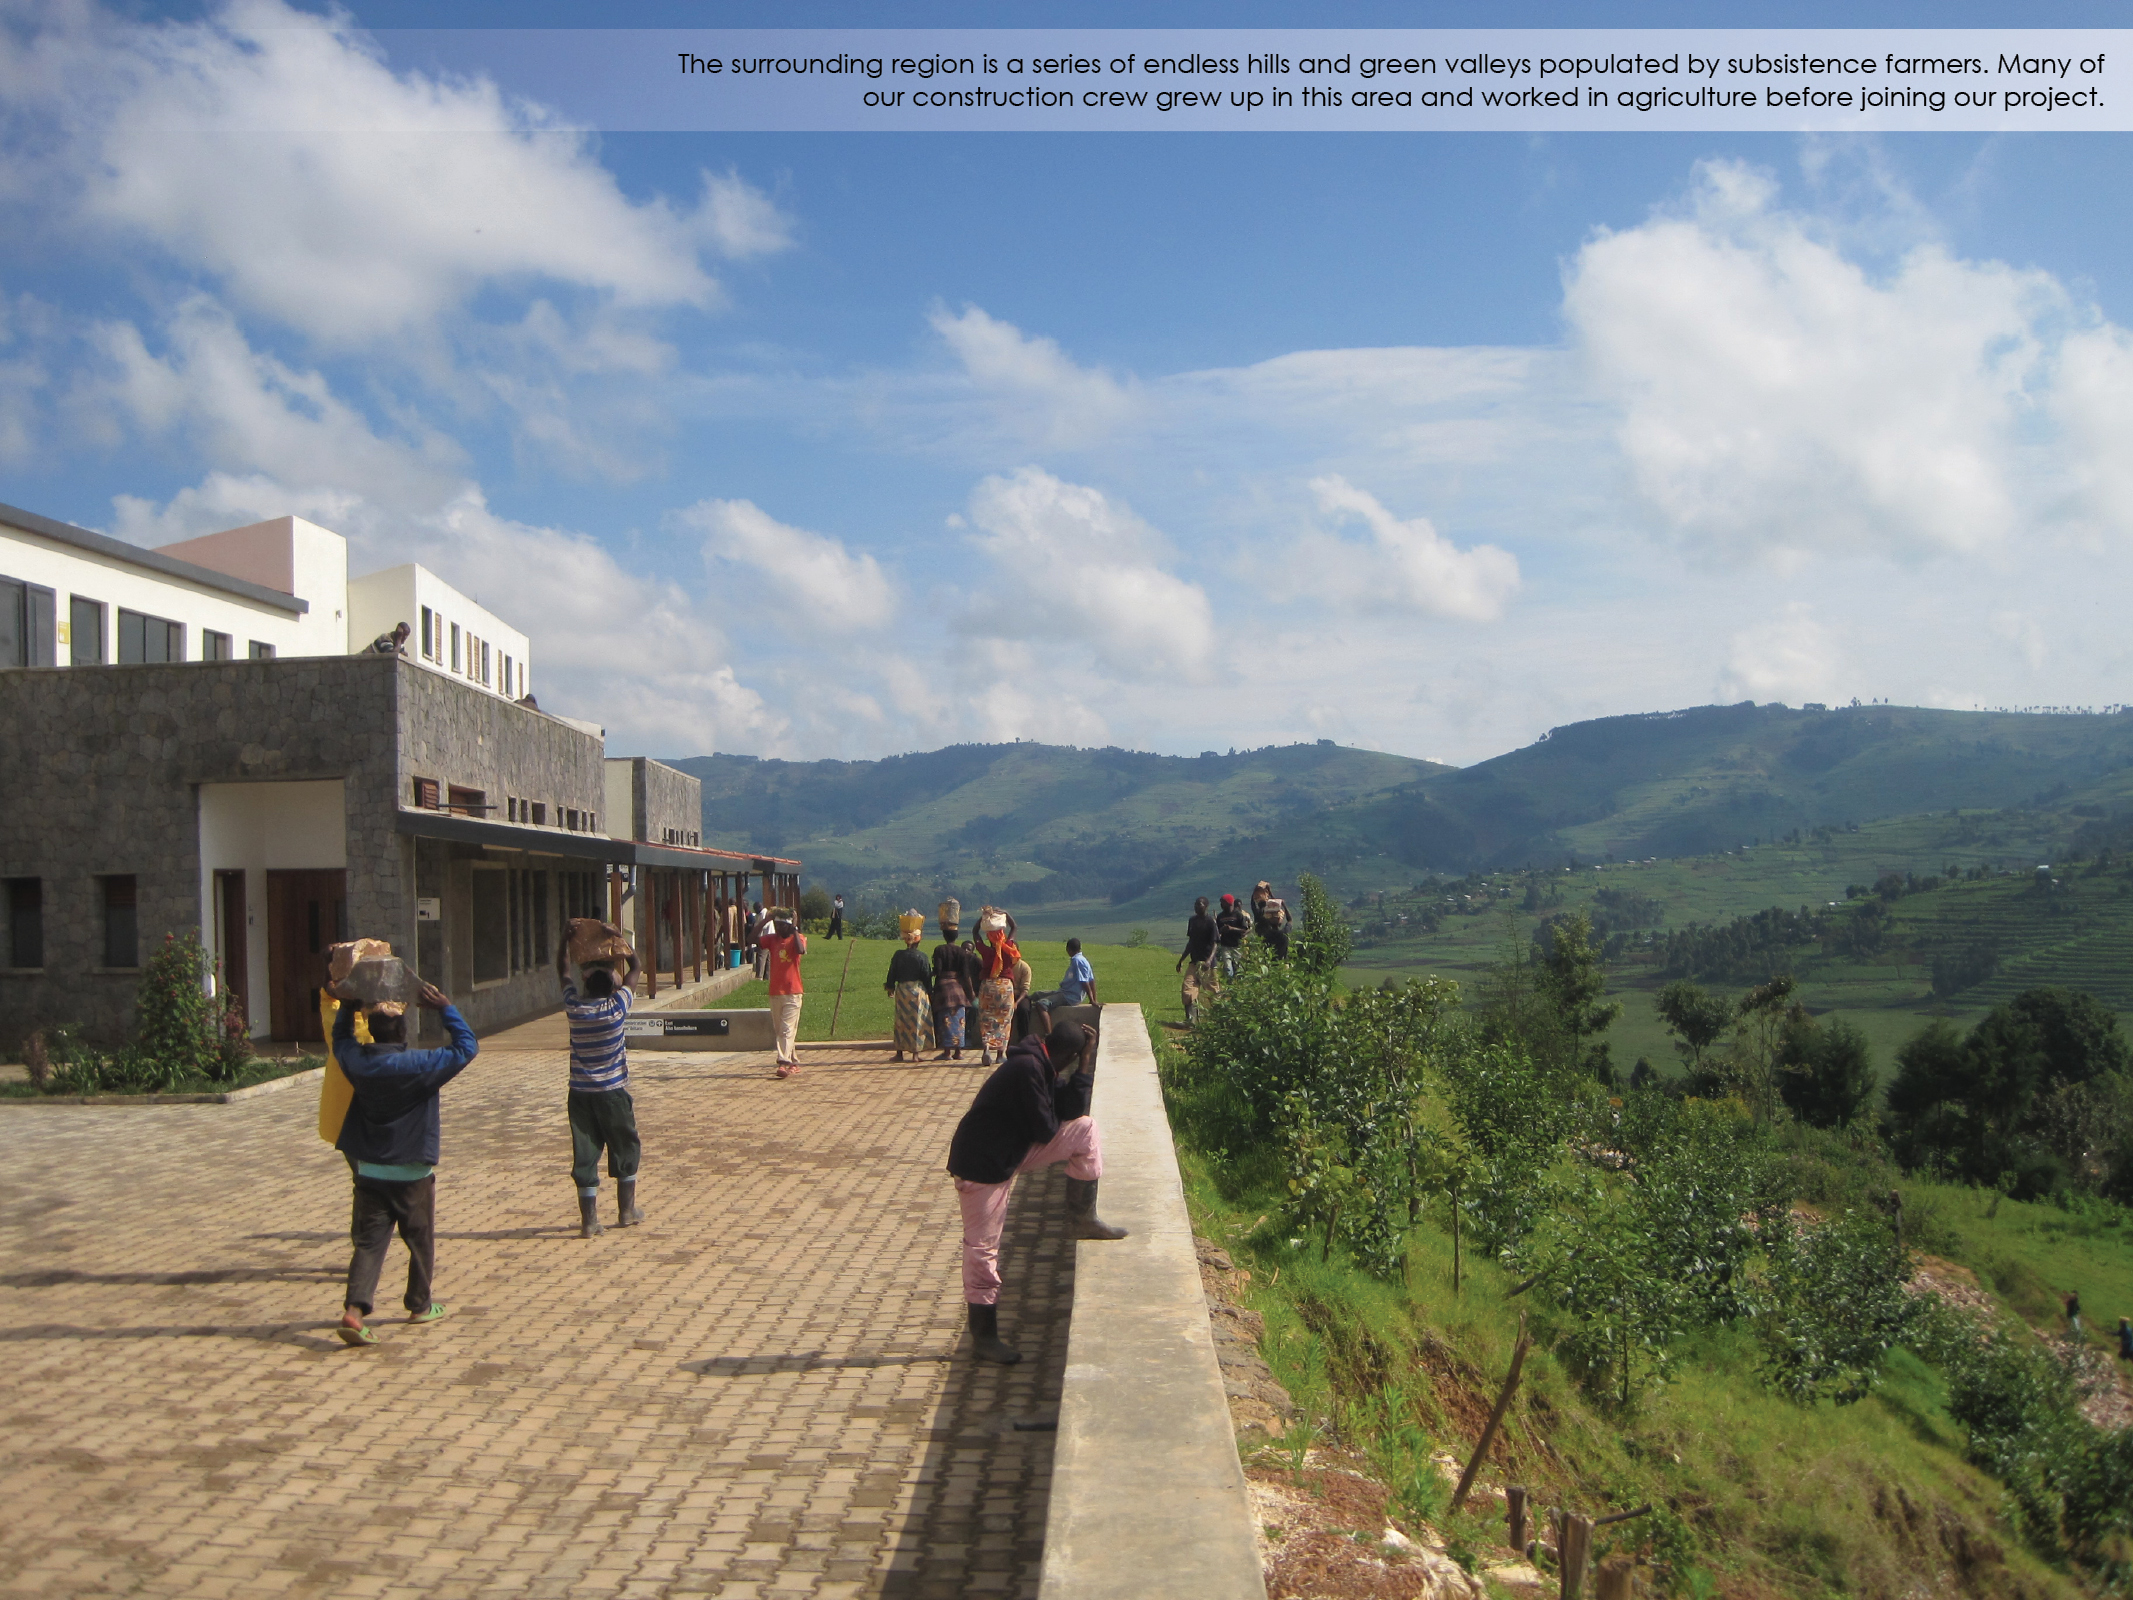 Gaugler_RwandaExperience_p3.jpg